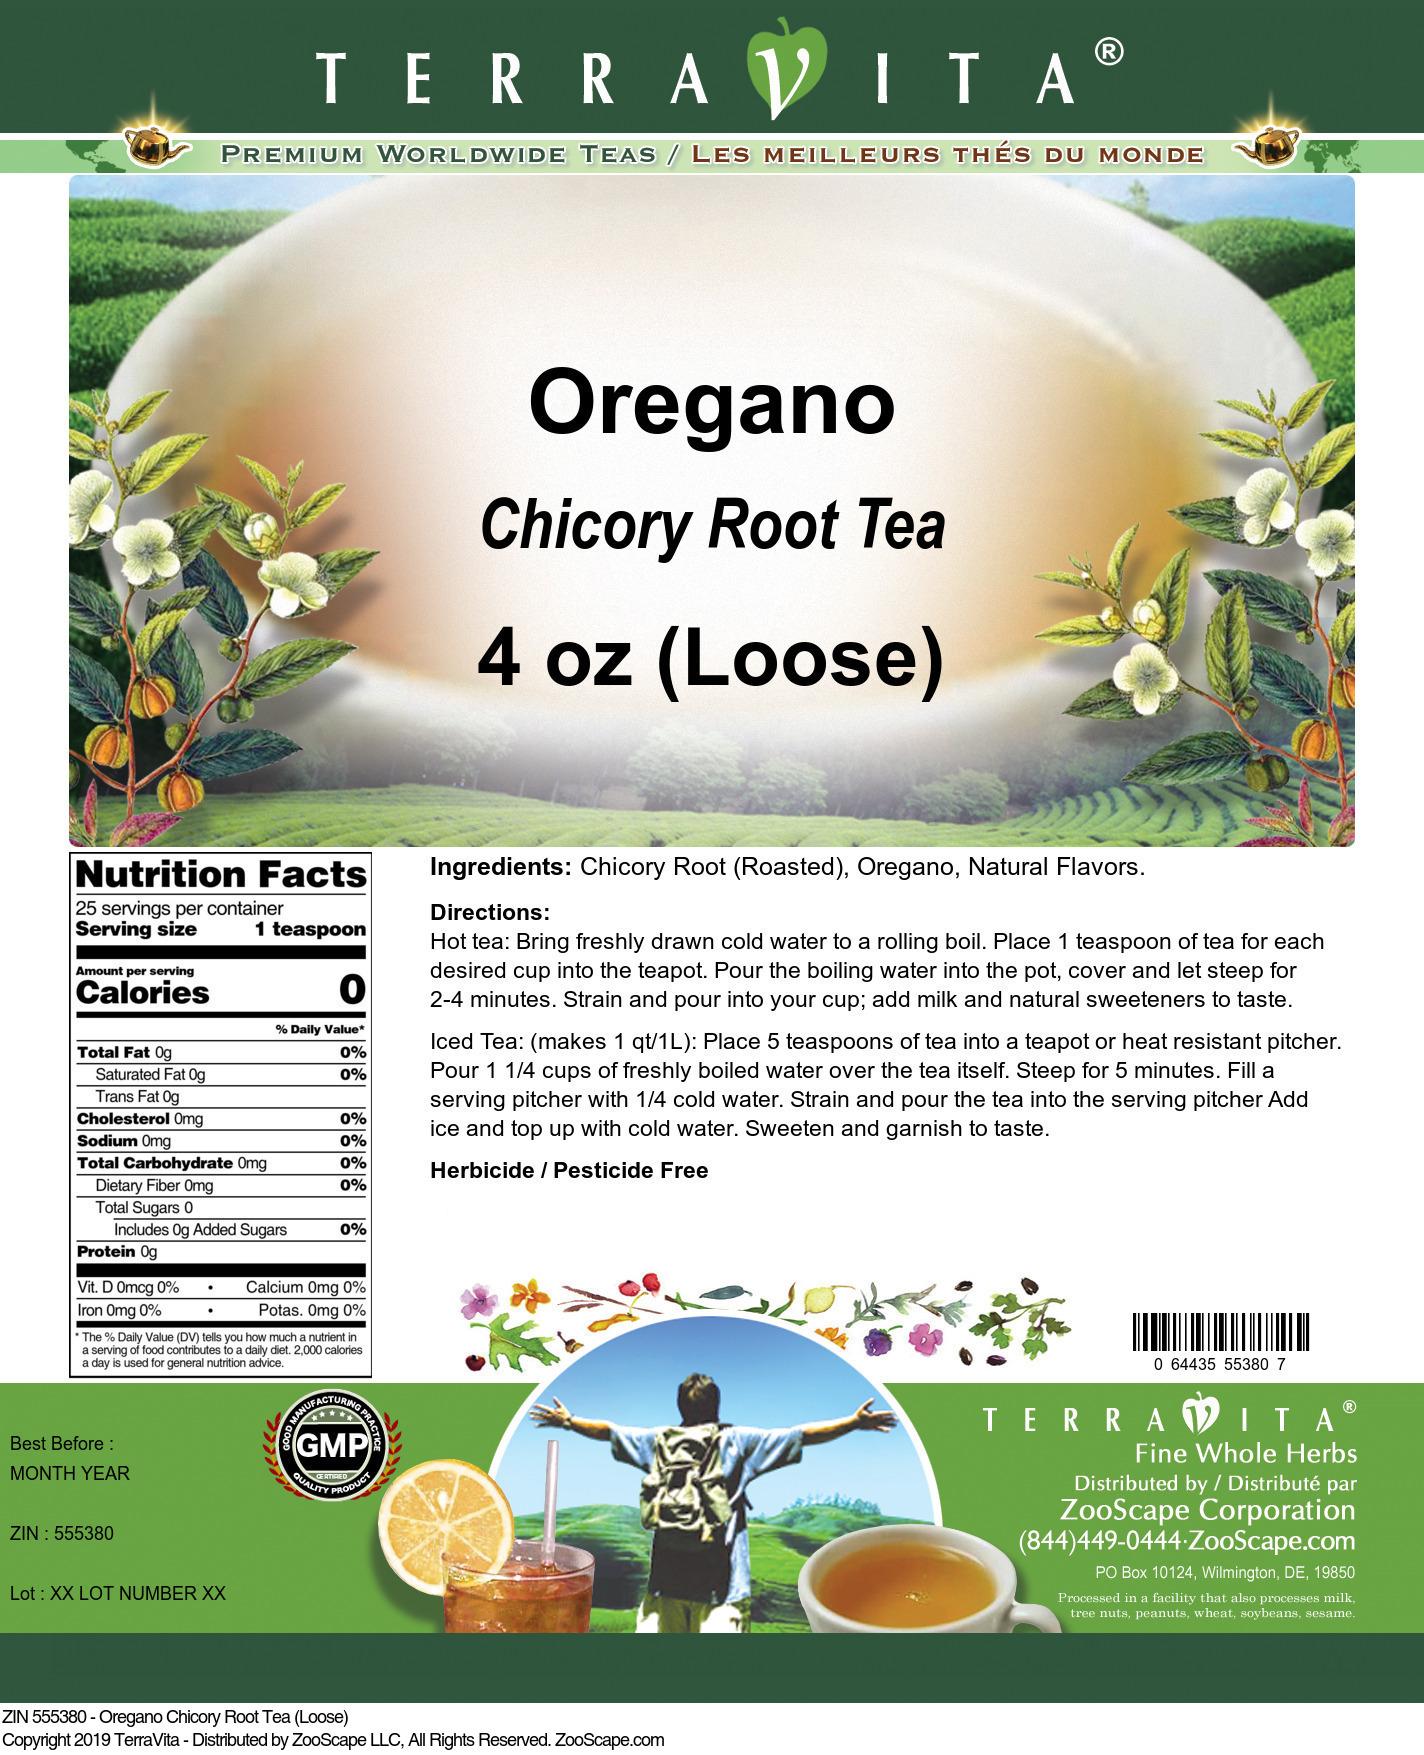 Oregano Chicory Root Tea (Loose)